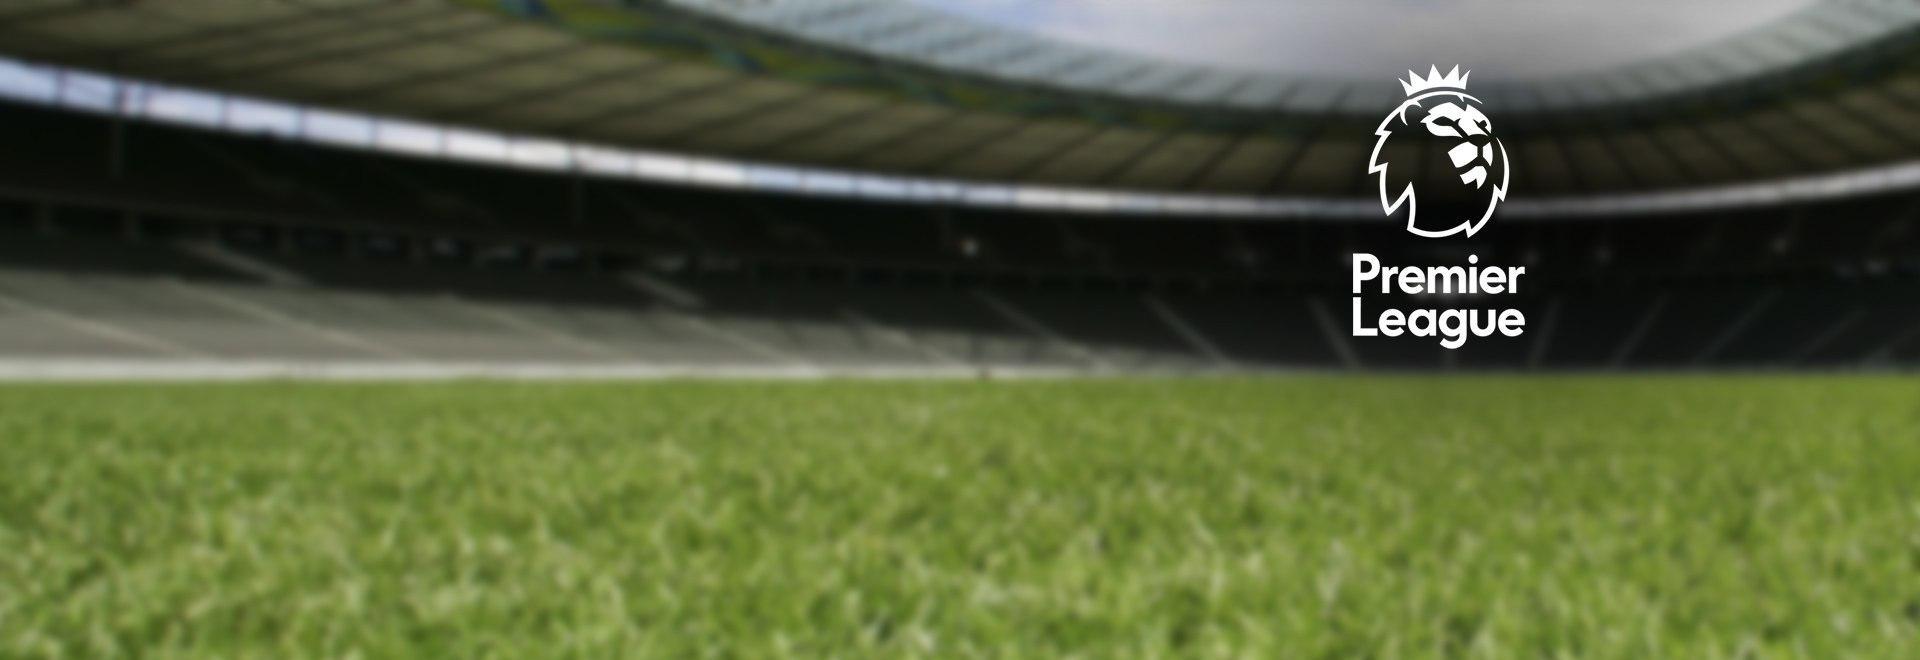 Man Utd - Crystal Palace. 2a g.